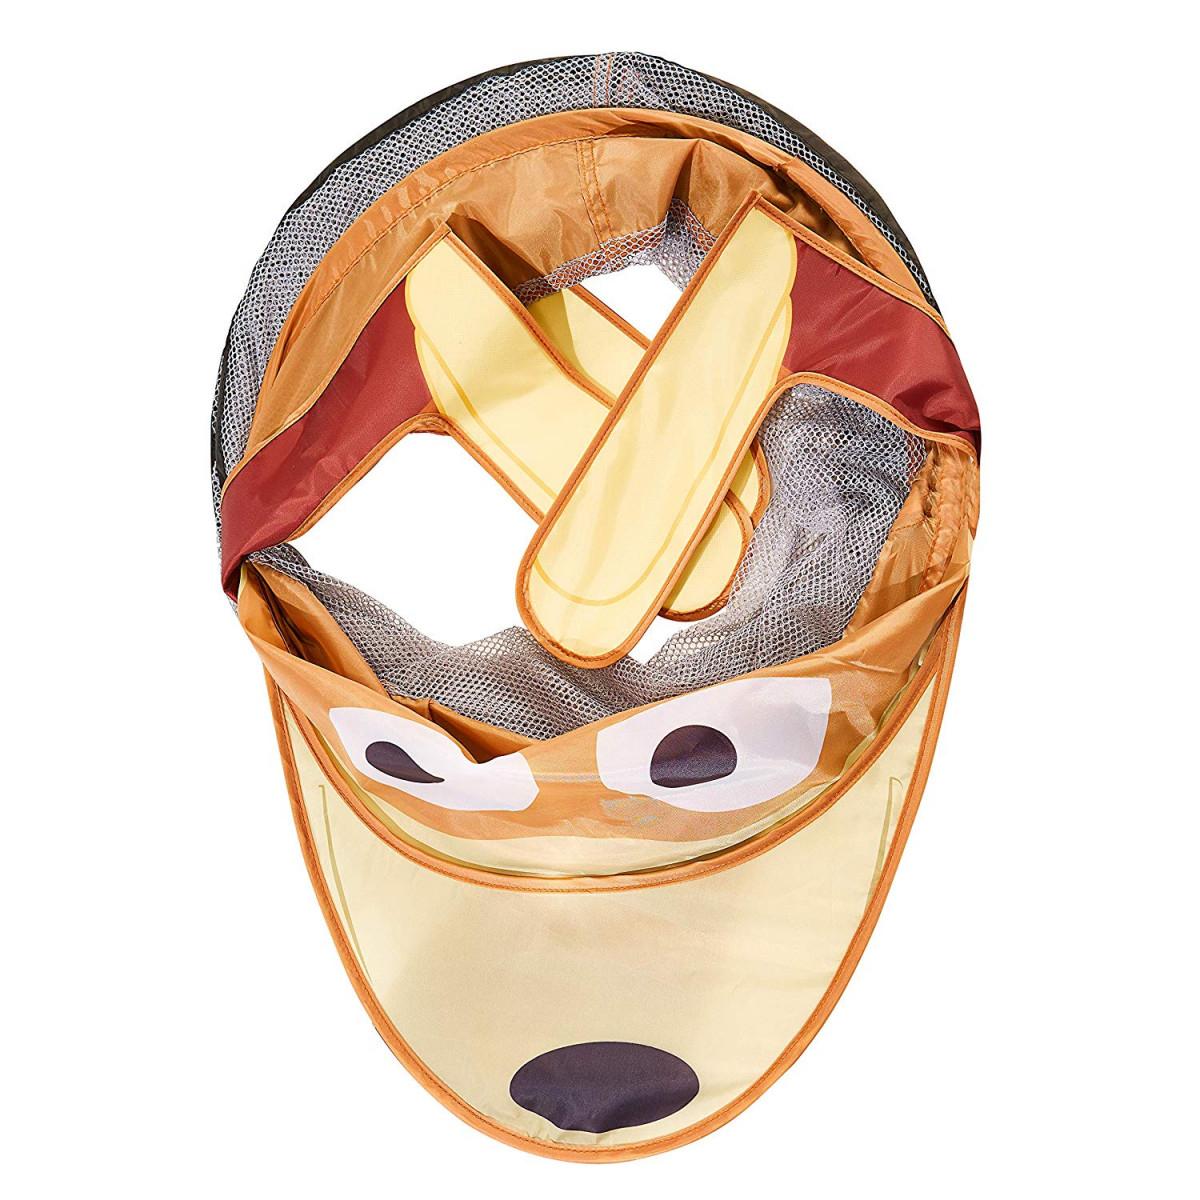 Tunnel De Jeu Pop-Up Zig-Zag Toy Story | Tente De Jeux Sur dedans Zig Zag Toy Story